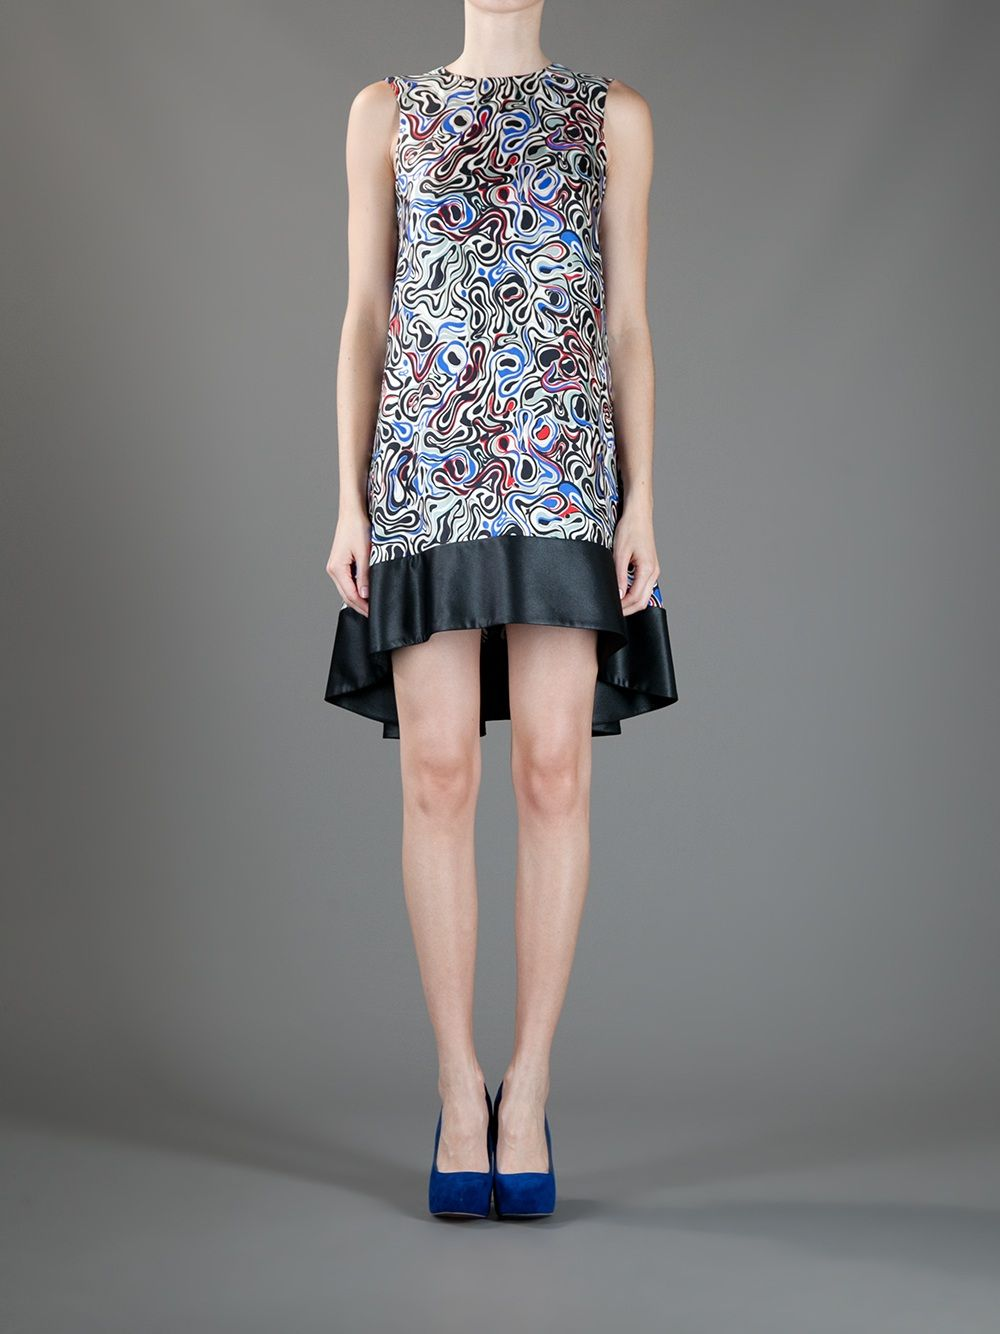 Balenciaga Abstract Dress - Tessabit - farfetch.com